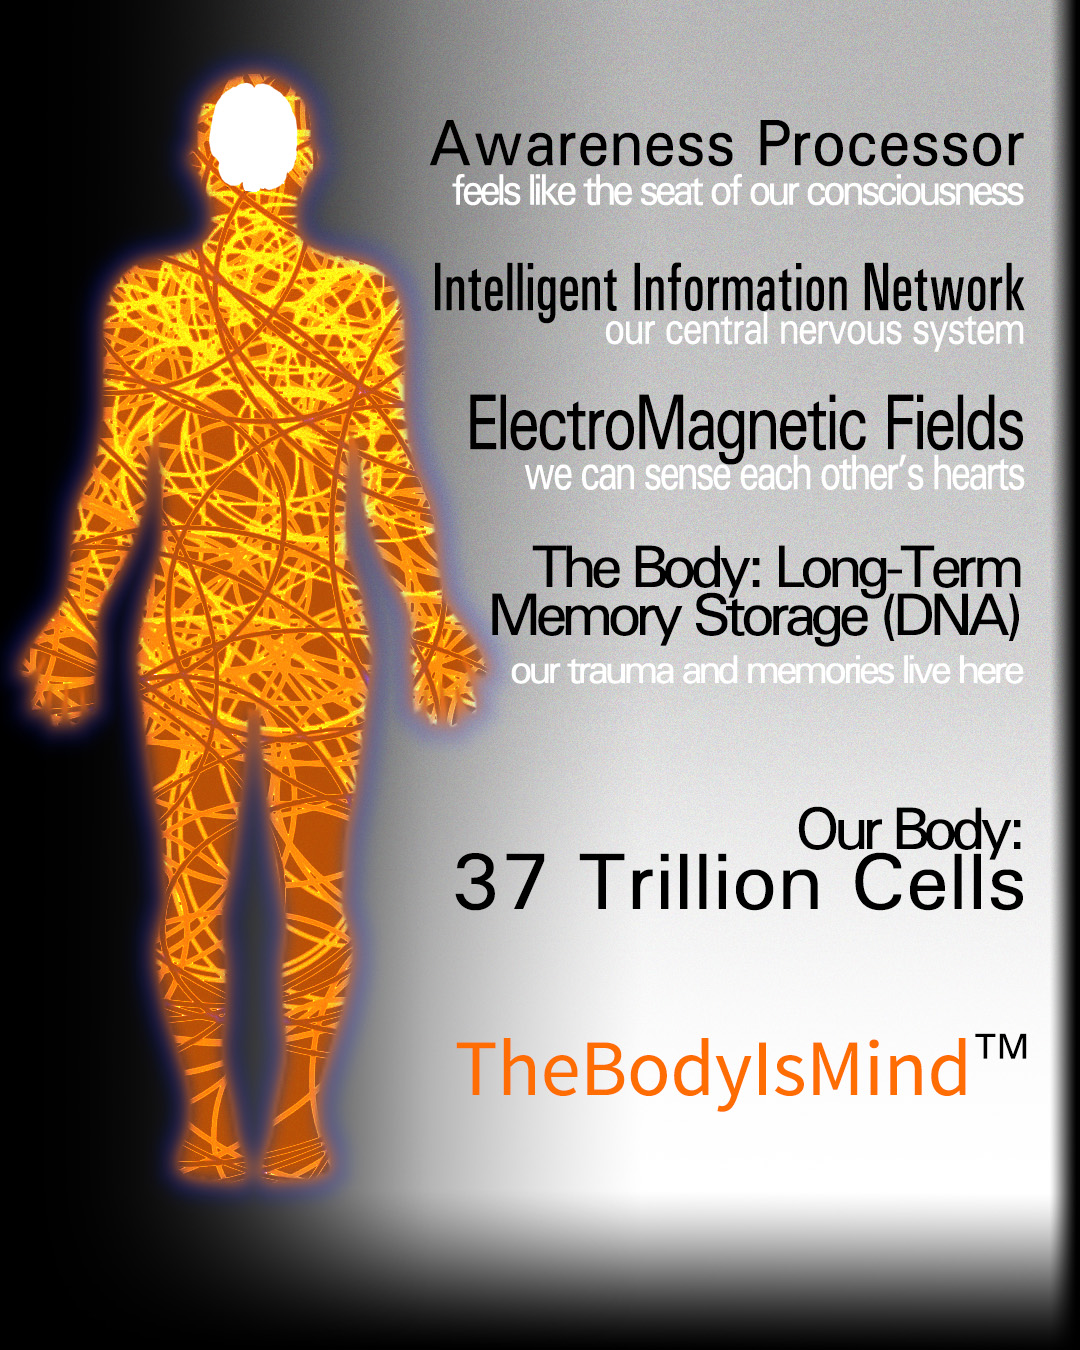 Our body averages 37 Trillion cells